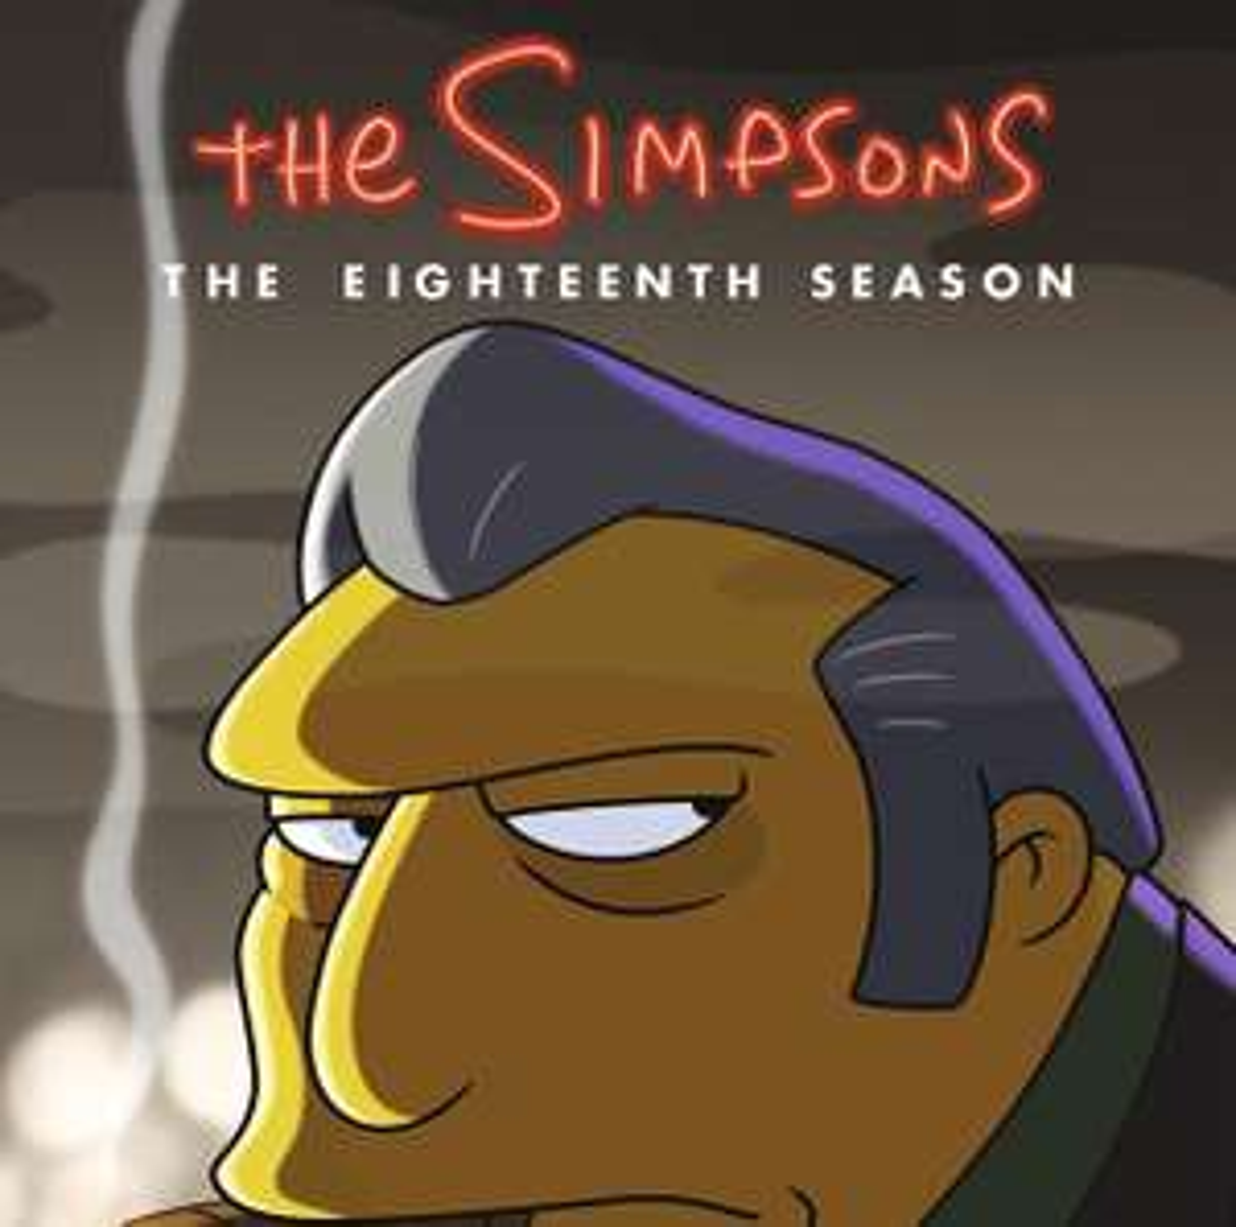 The Simpsons Complete 18th Season DVD (pre-order) £19.99 (Prime) @ Amazon & HMV